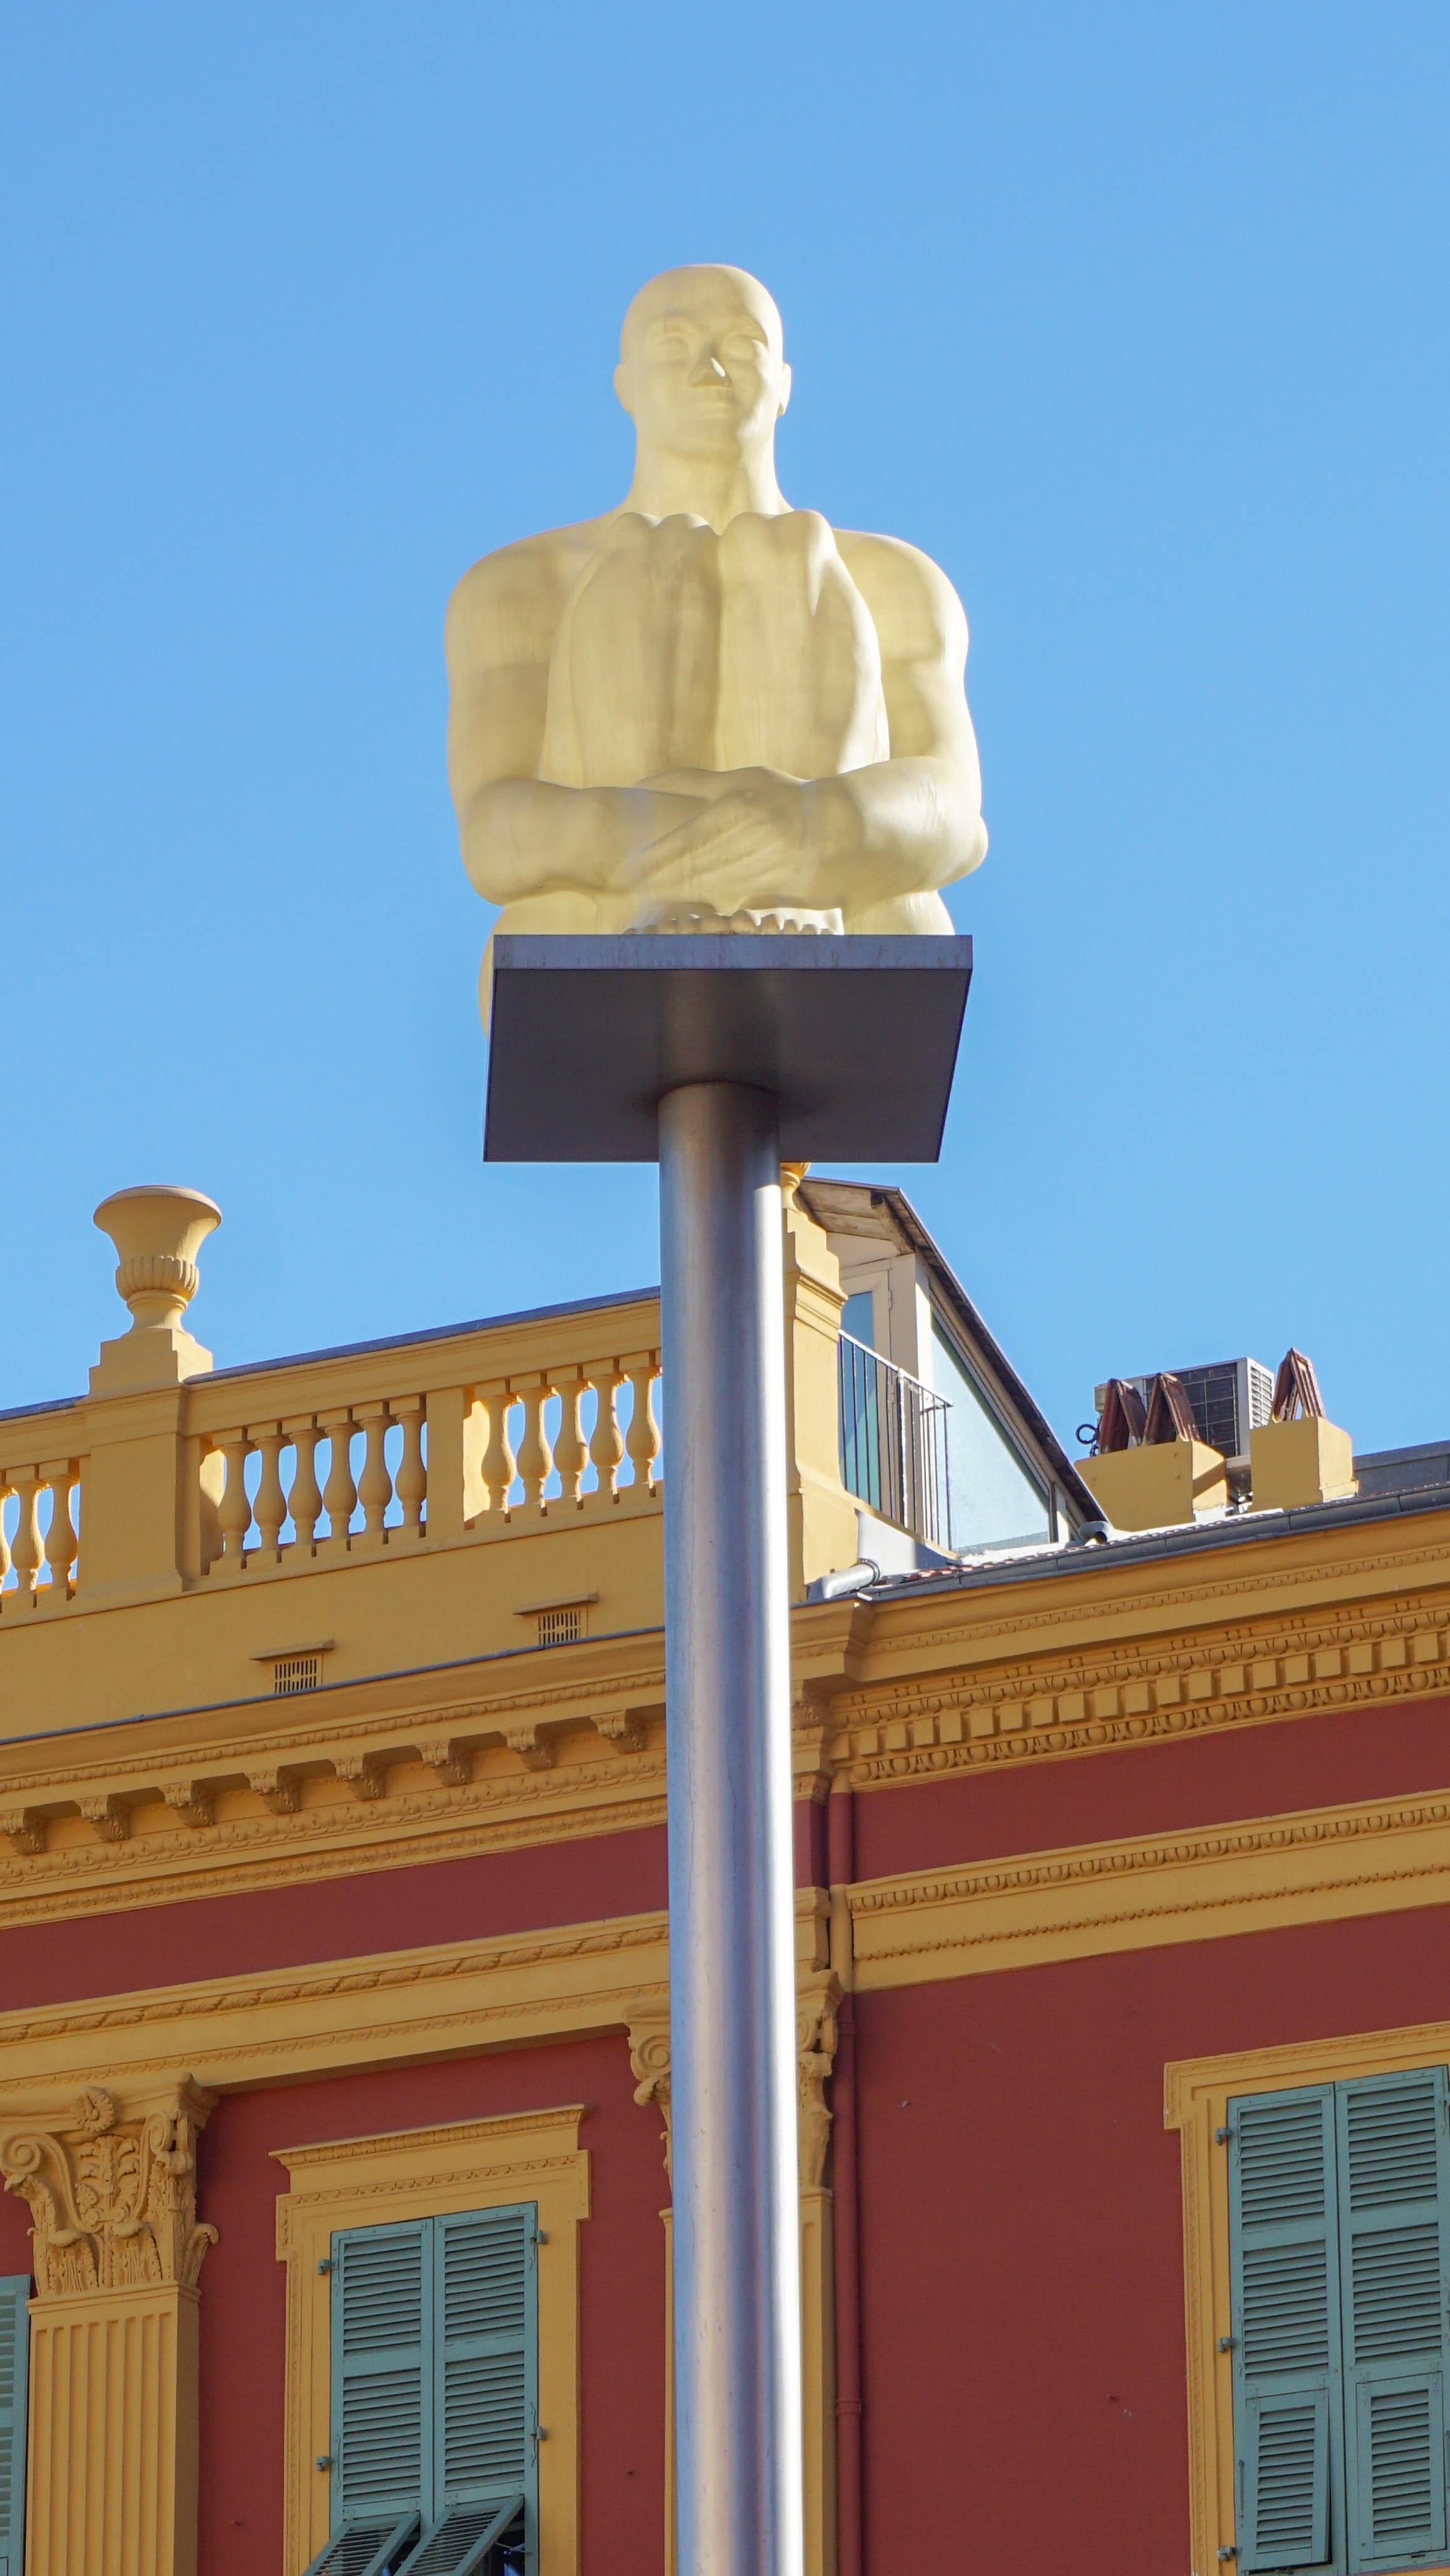 Glowing statue of a sitting man at Place Massena, Nice, France